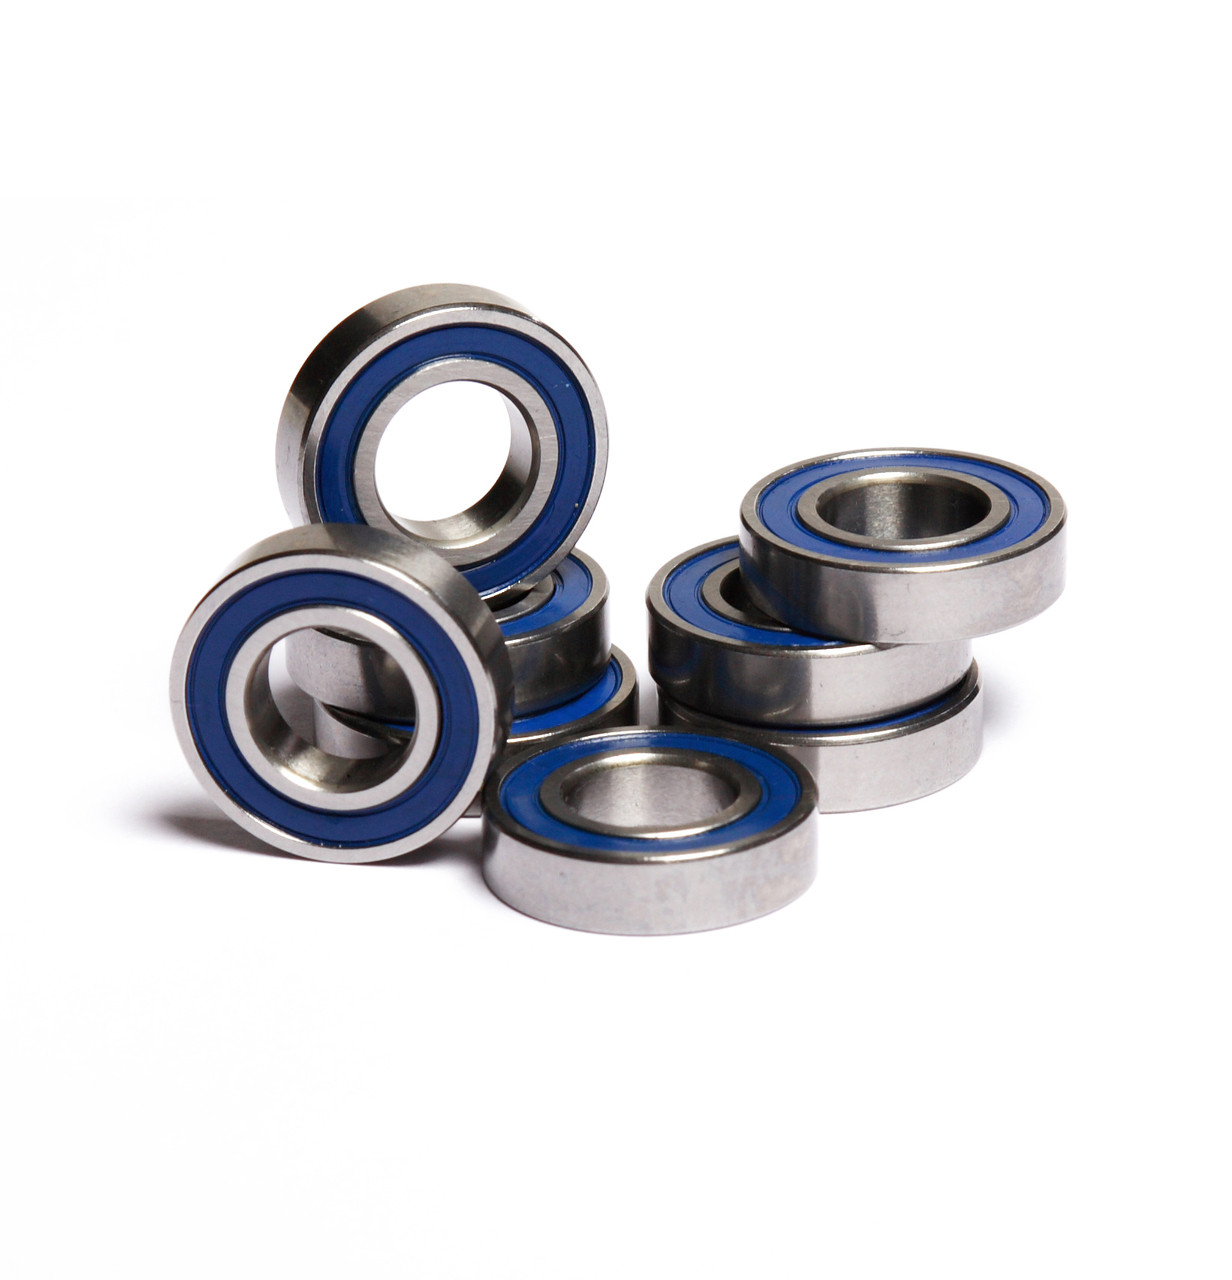 Team Losi Desert Buggy XL DBXL & DBXL-E 8 piece wheel bearing kit.